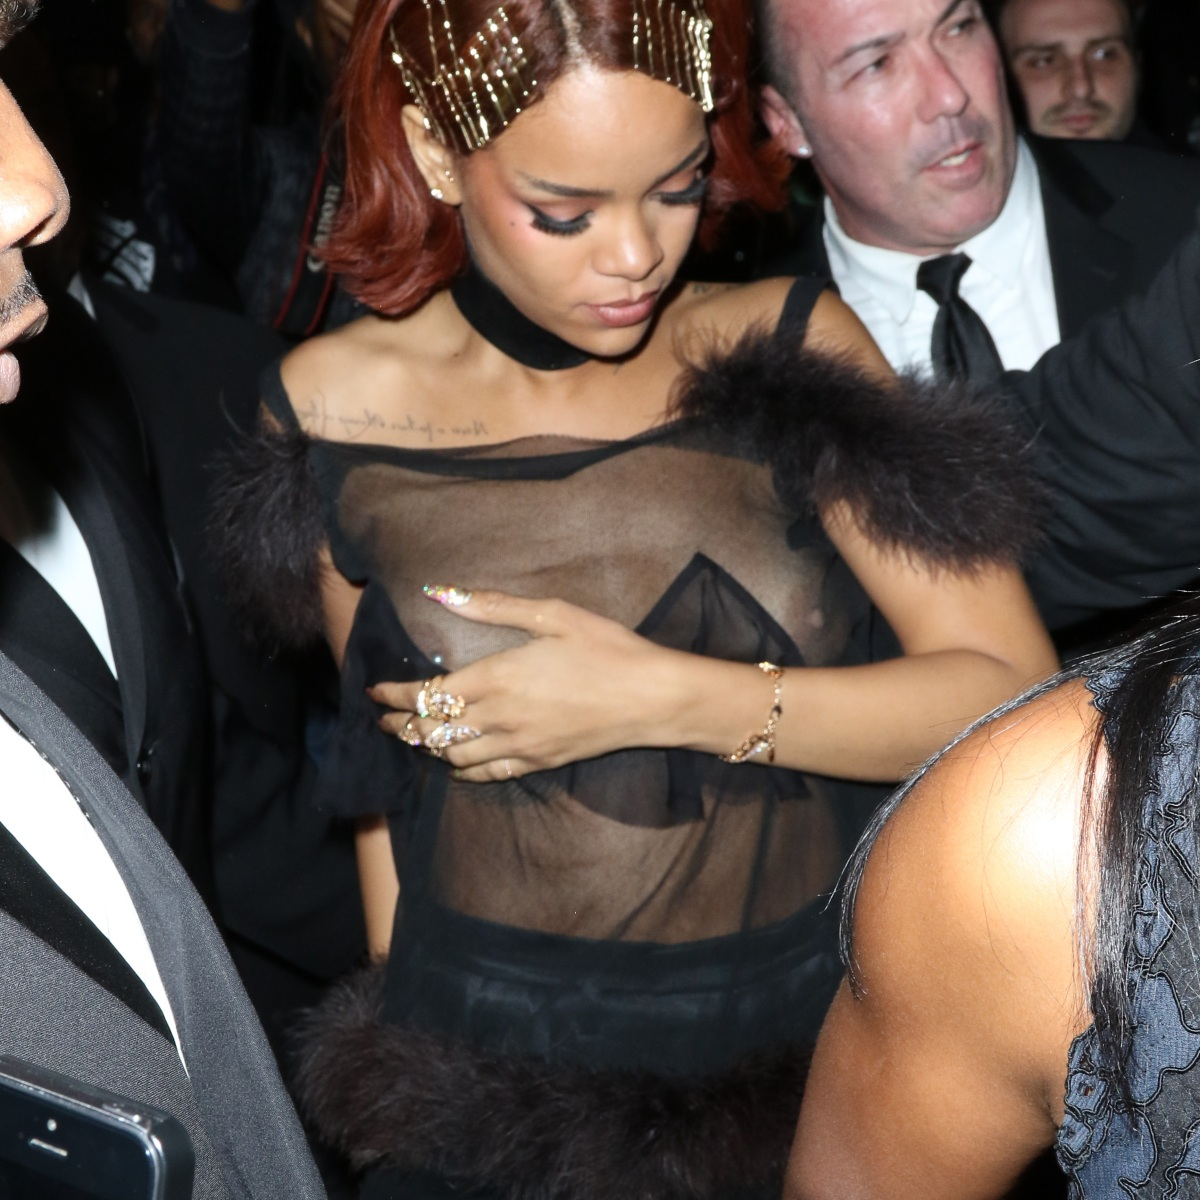 Rihanna Boob Slip photo 2